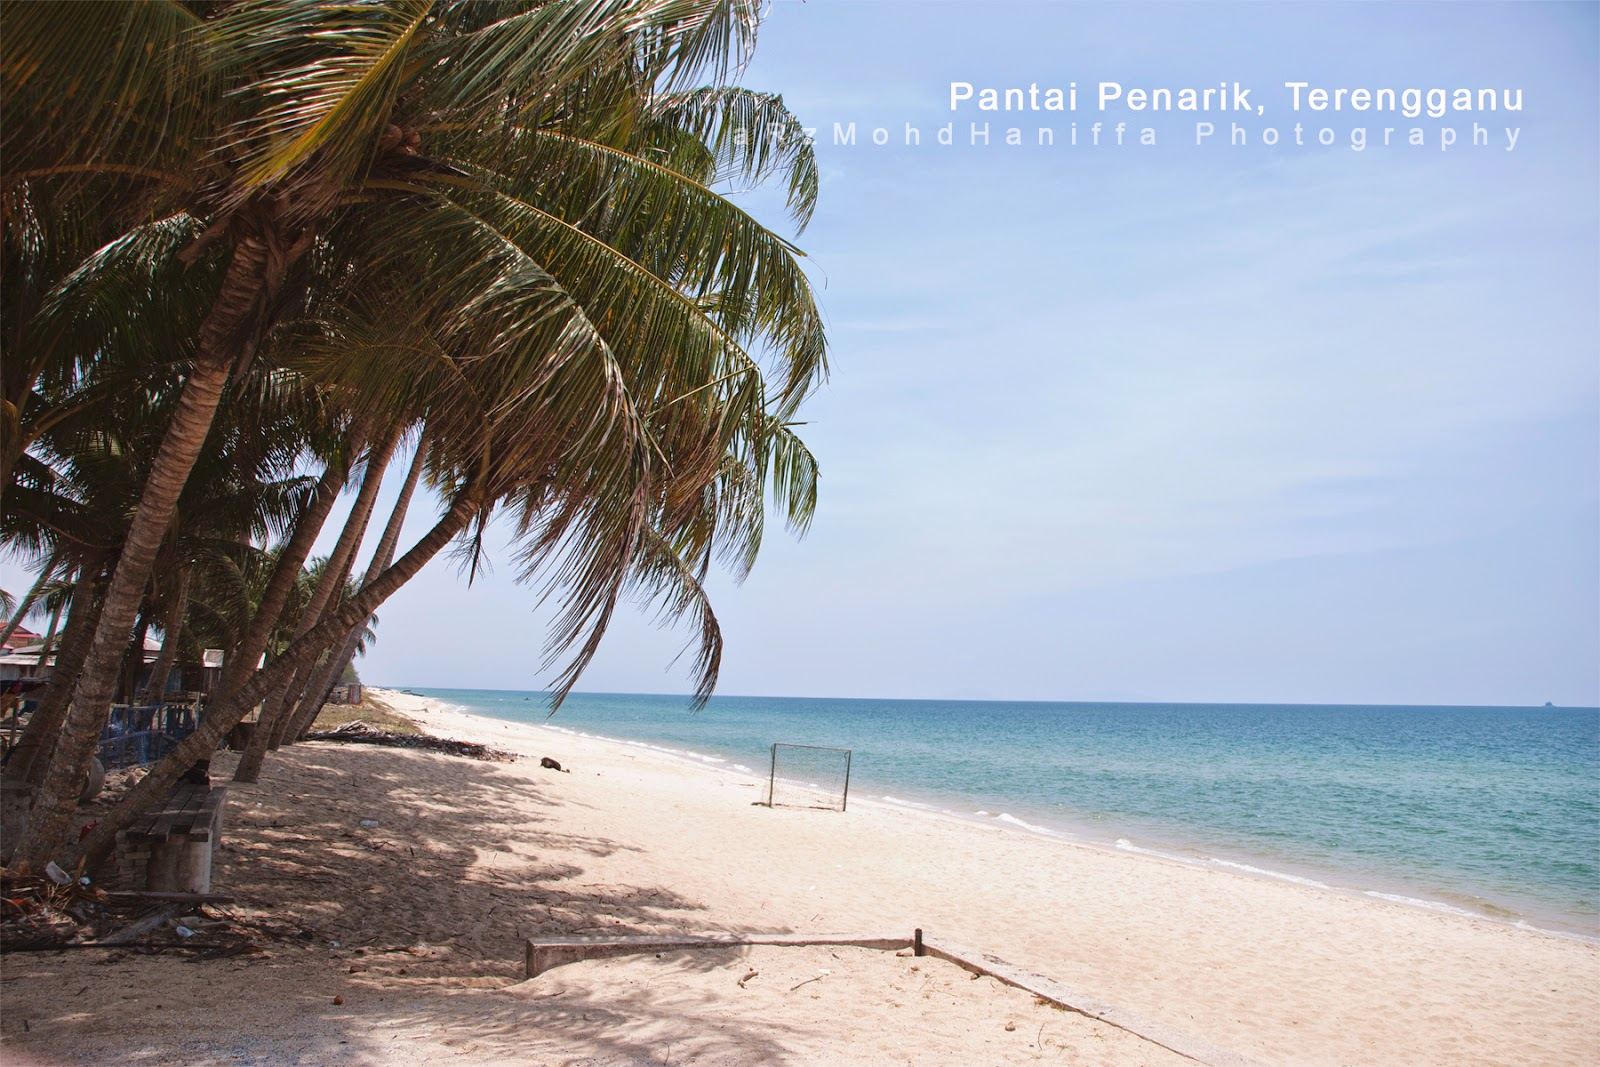 Penarik, Terengganu, gambar cantik, arzmohdhaniffa